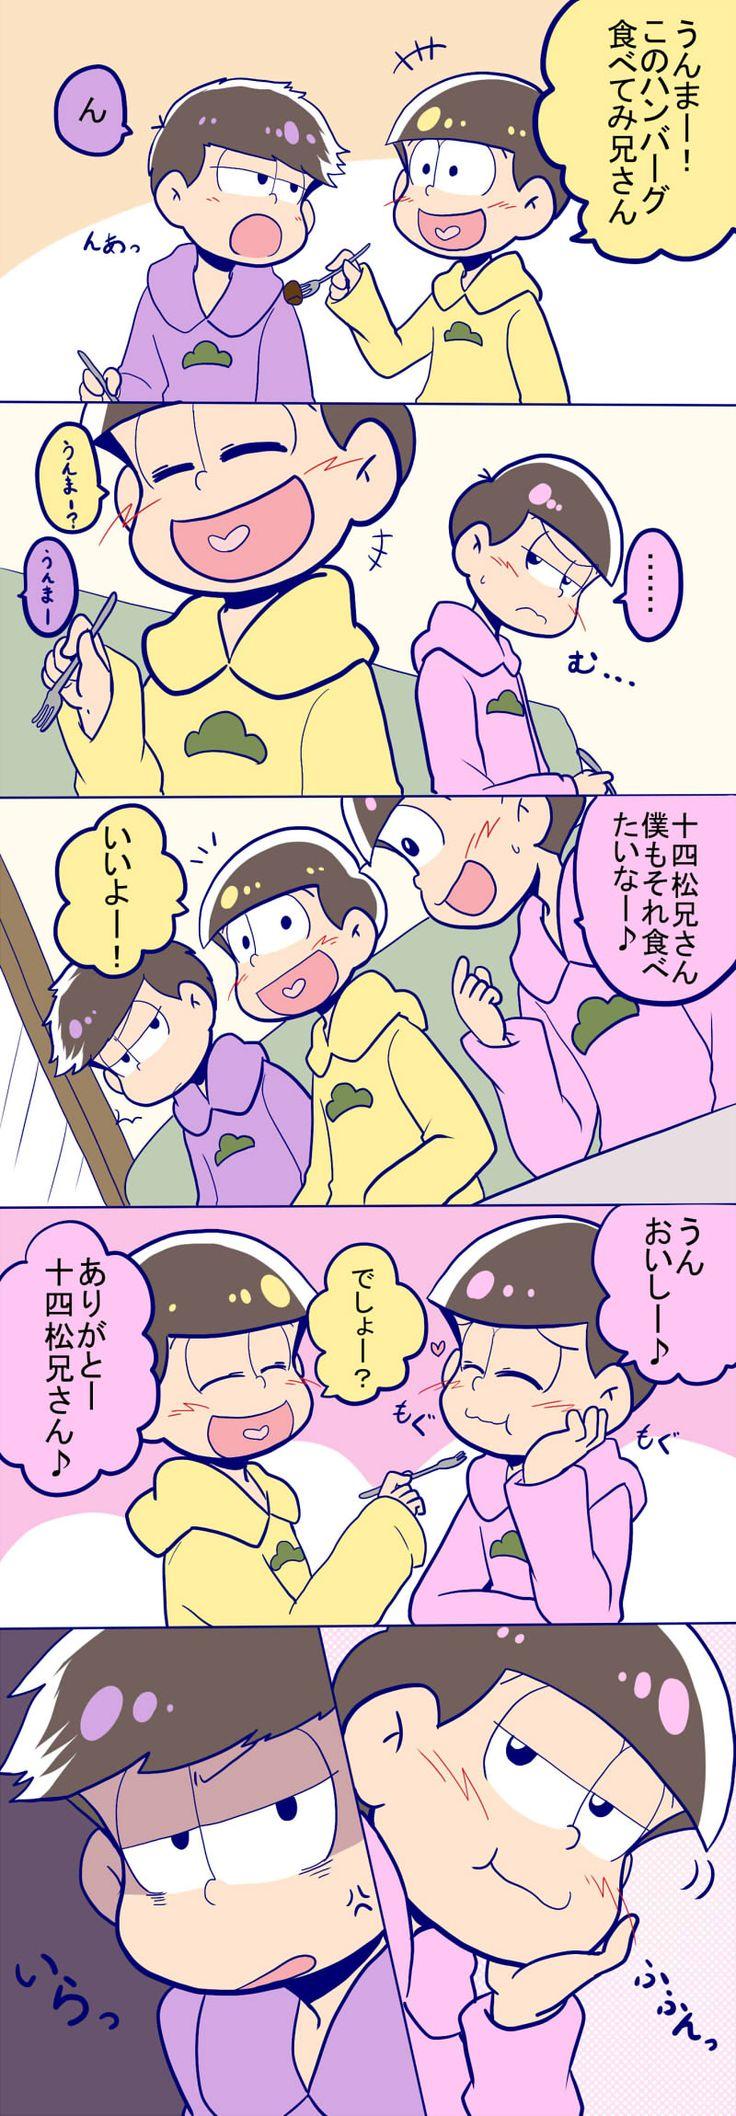 Jyuishimatsu ( I have a hard time spelling his name ) Todomatsu and Ichimatsu its on!